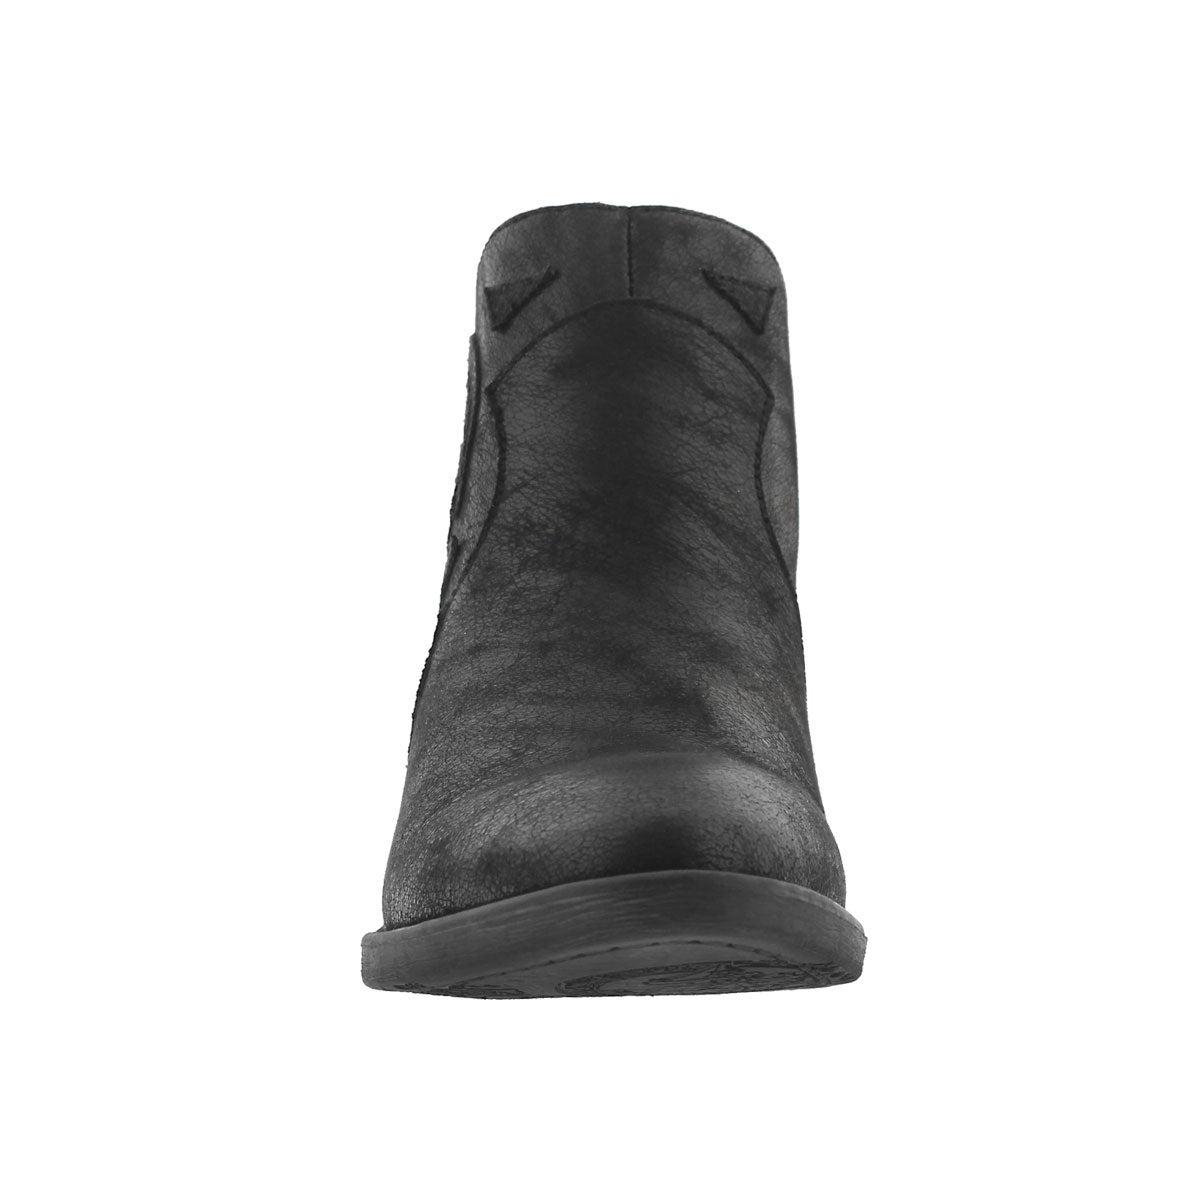 SoftMoc-Women-039-s-Tatiana-Casual-Ankle-Boot